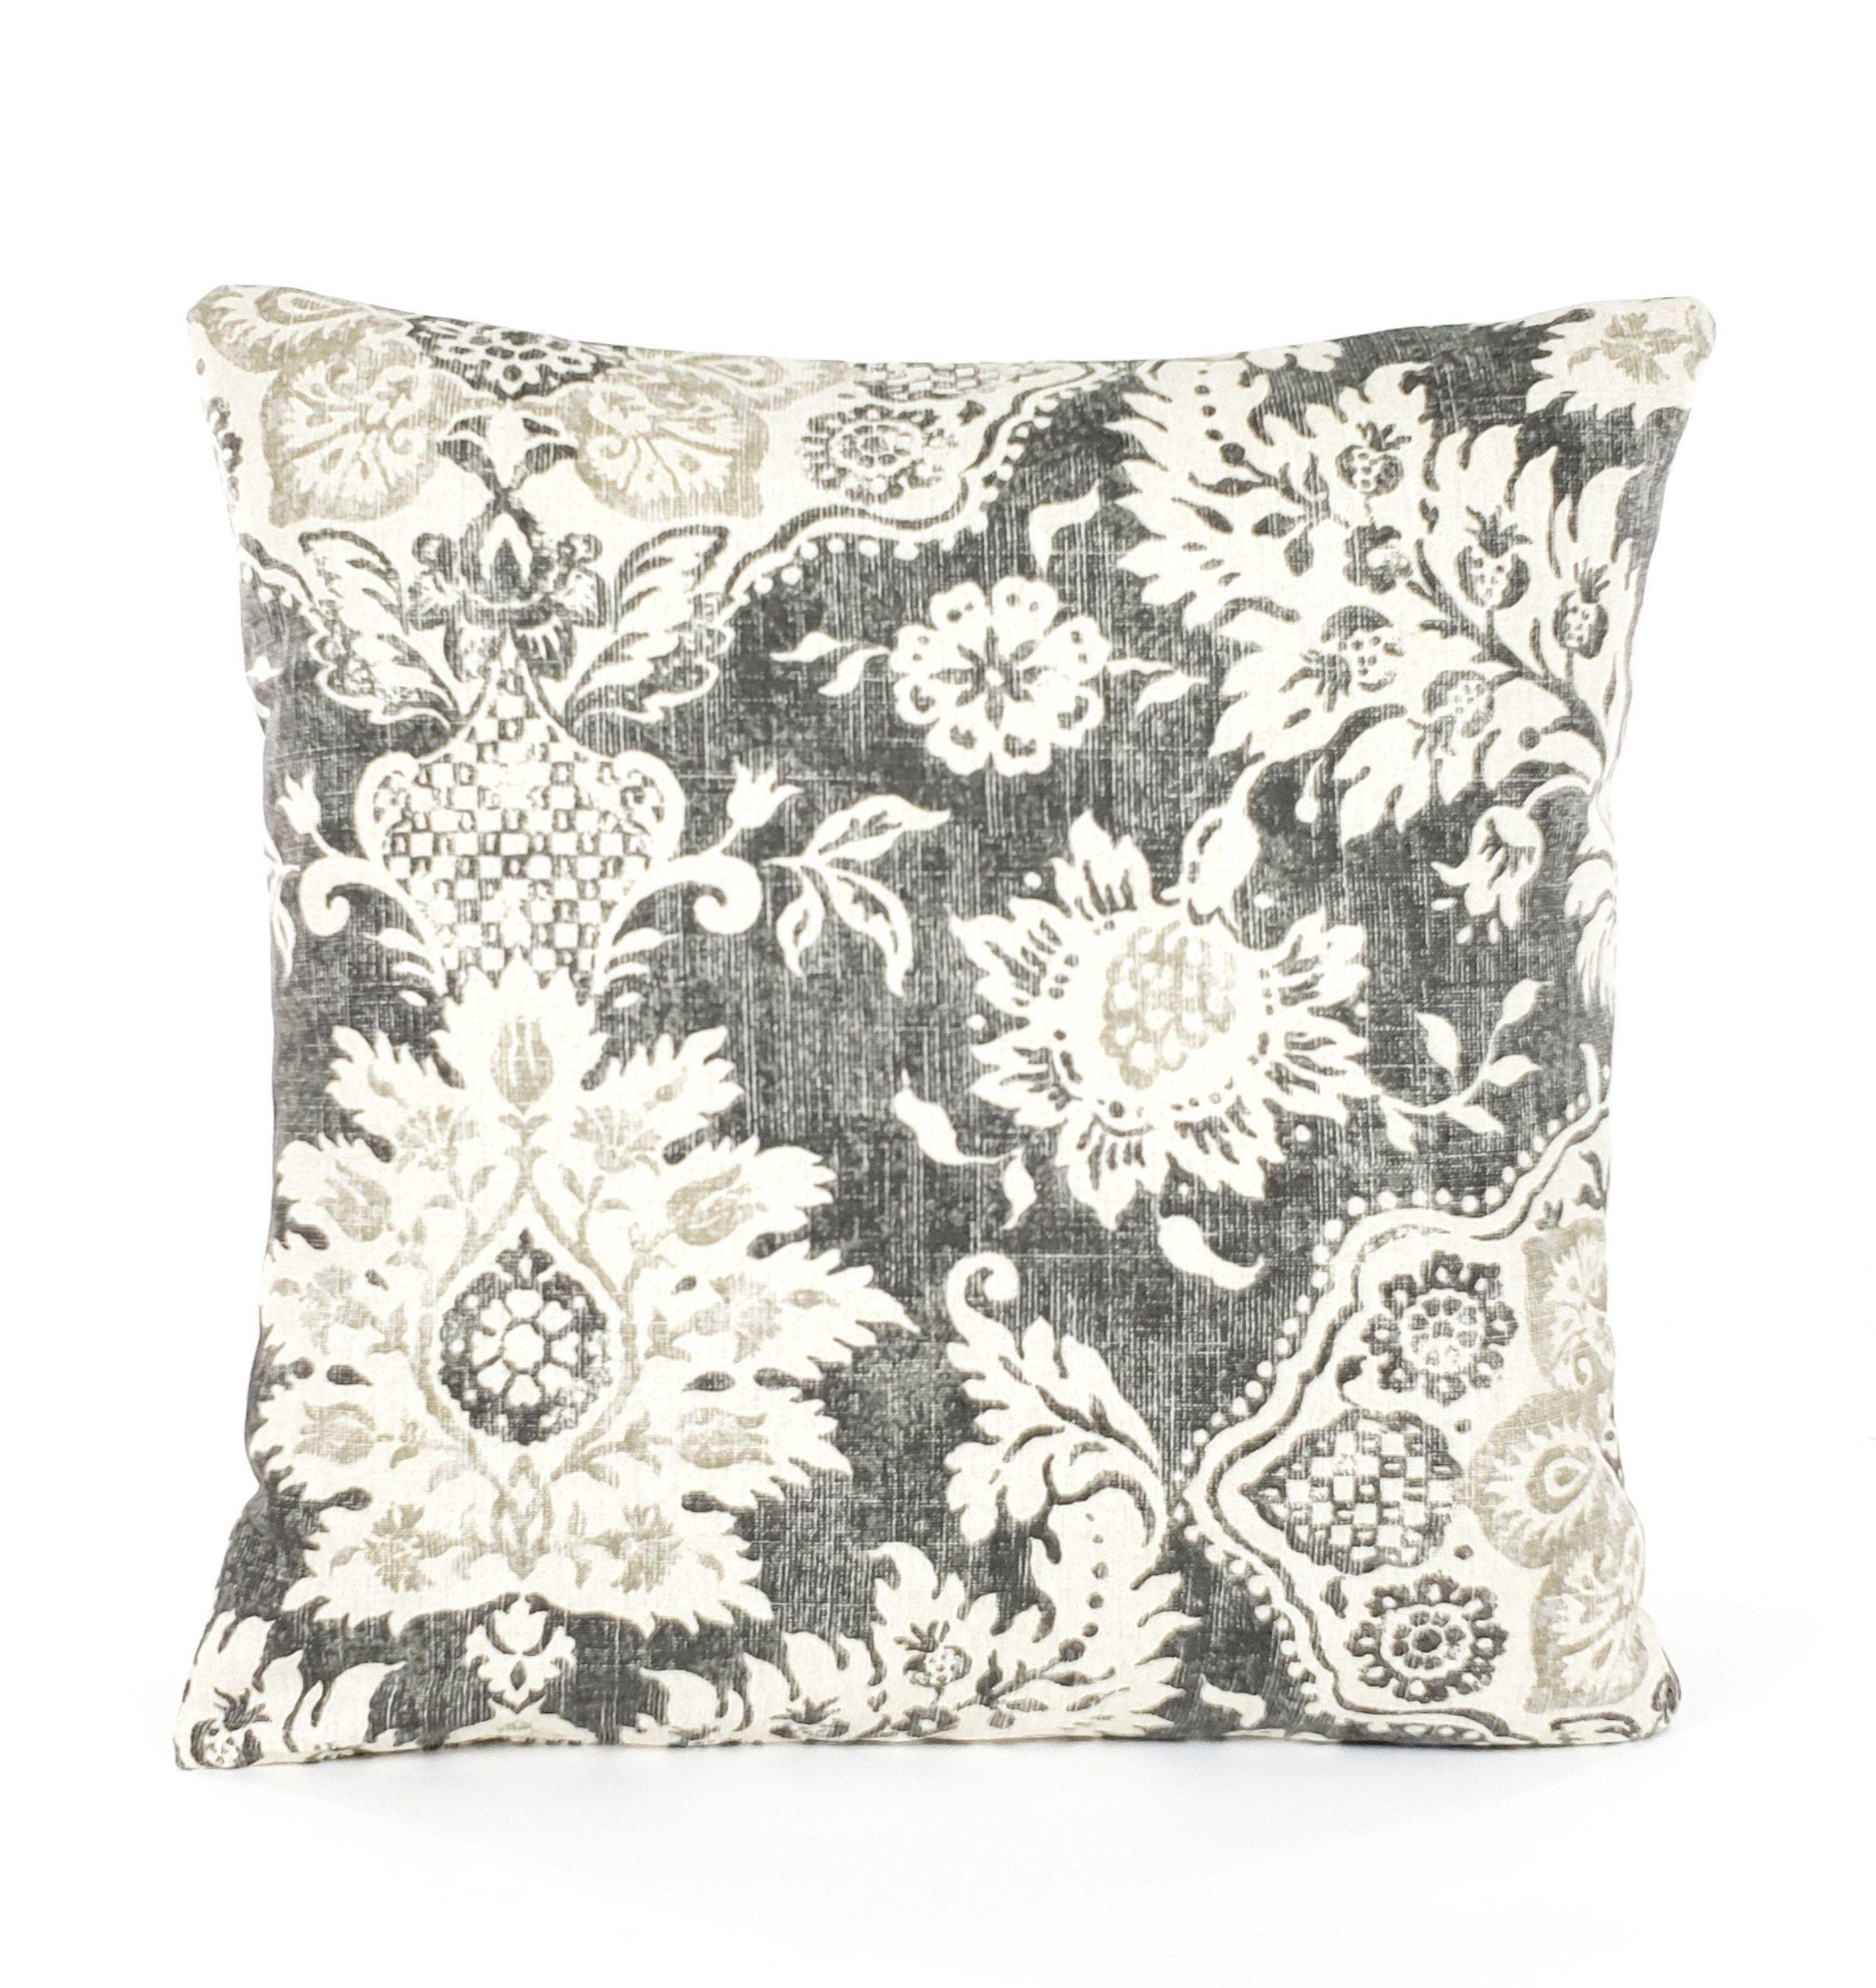 Gray Tan Floral Decorative Farmhouse Throw Pillow Covers Grey